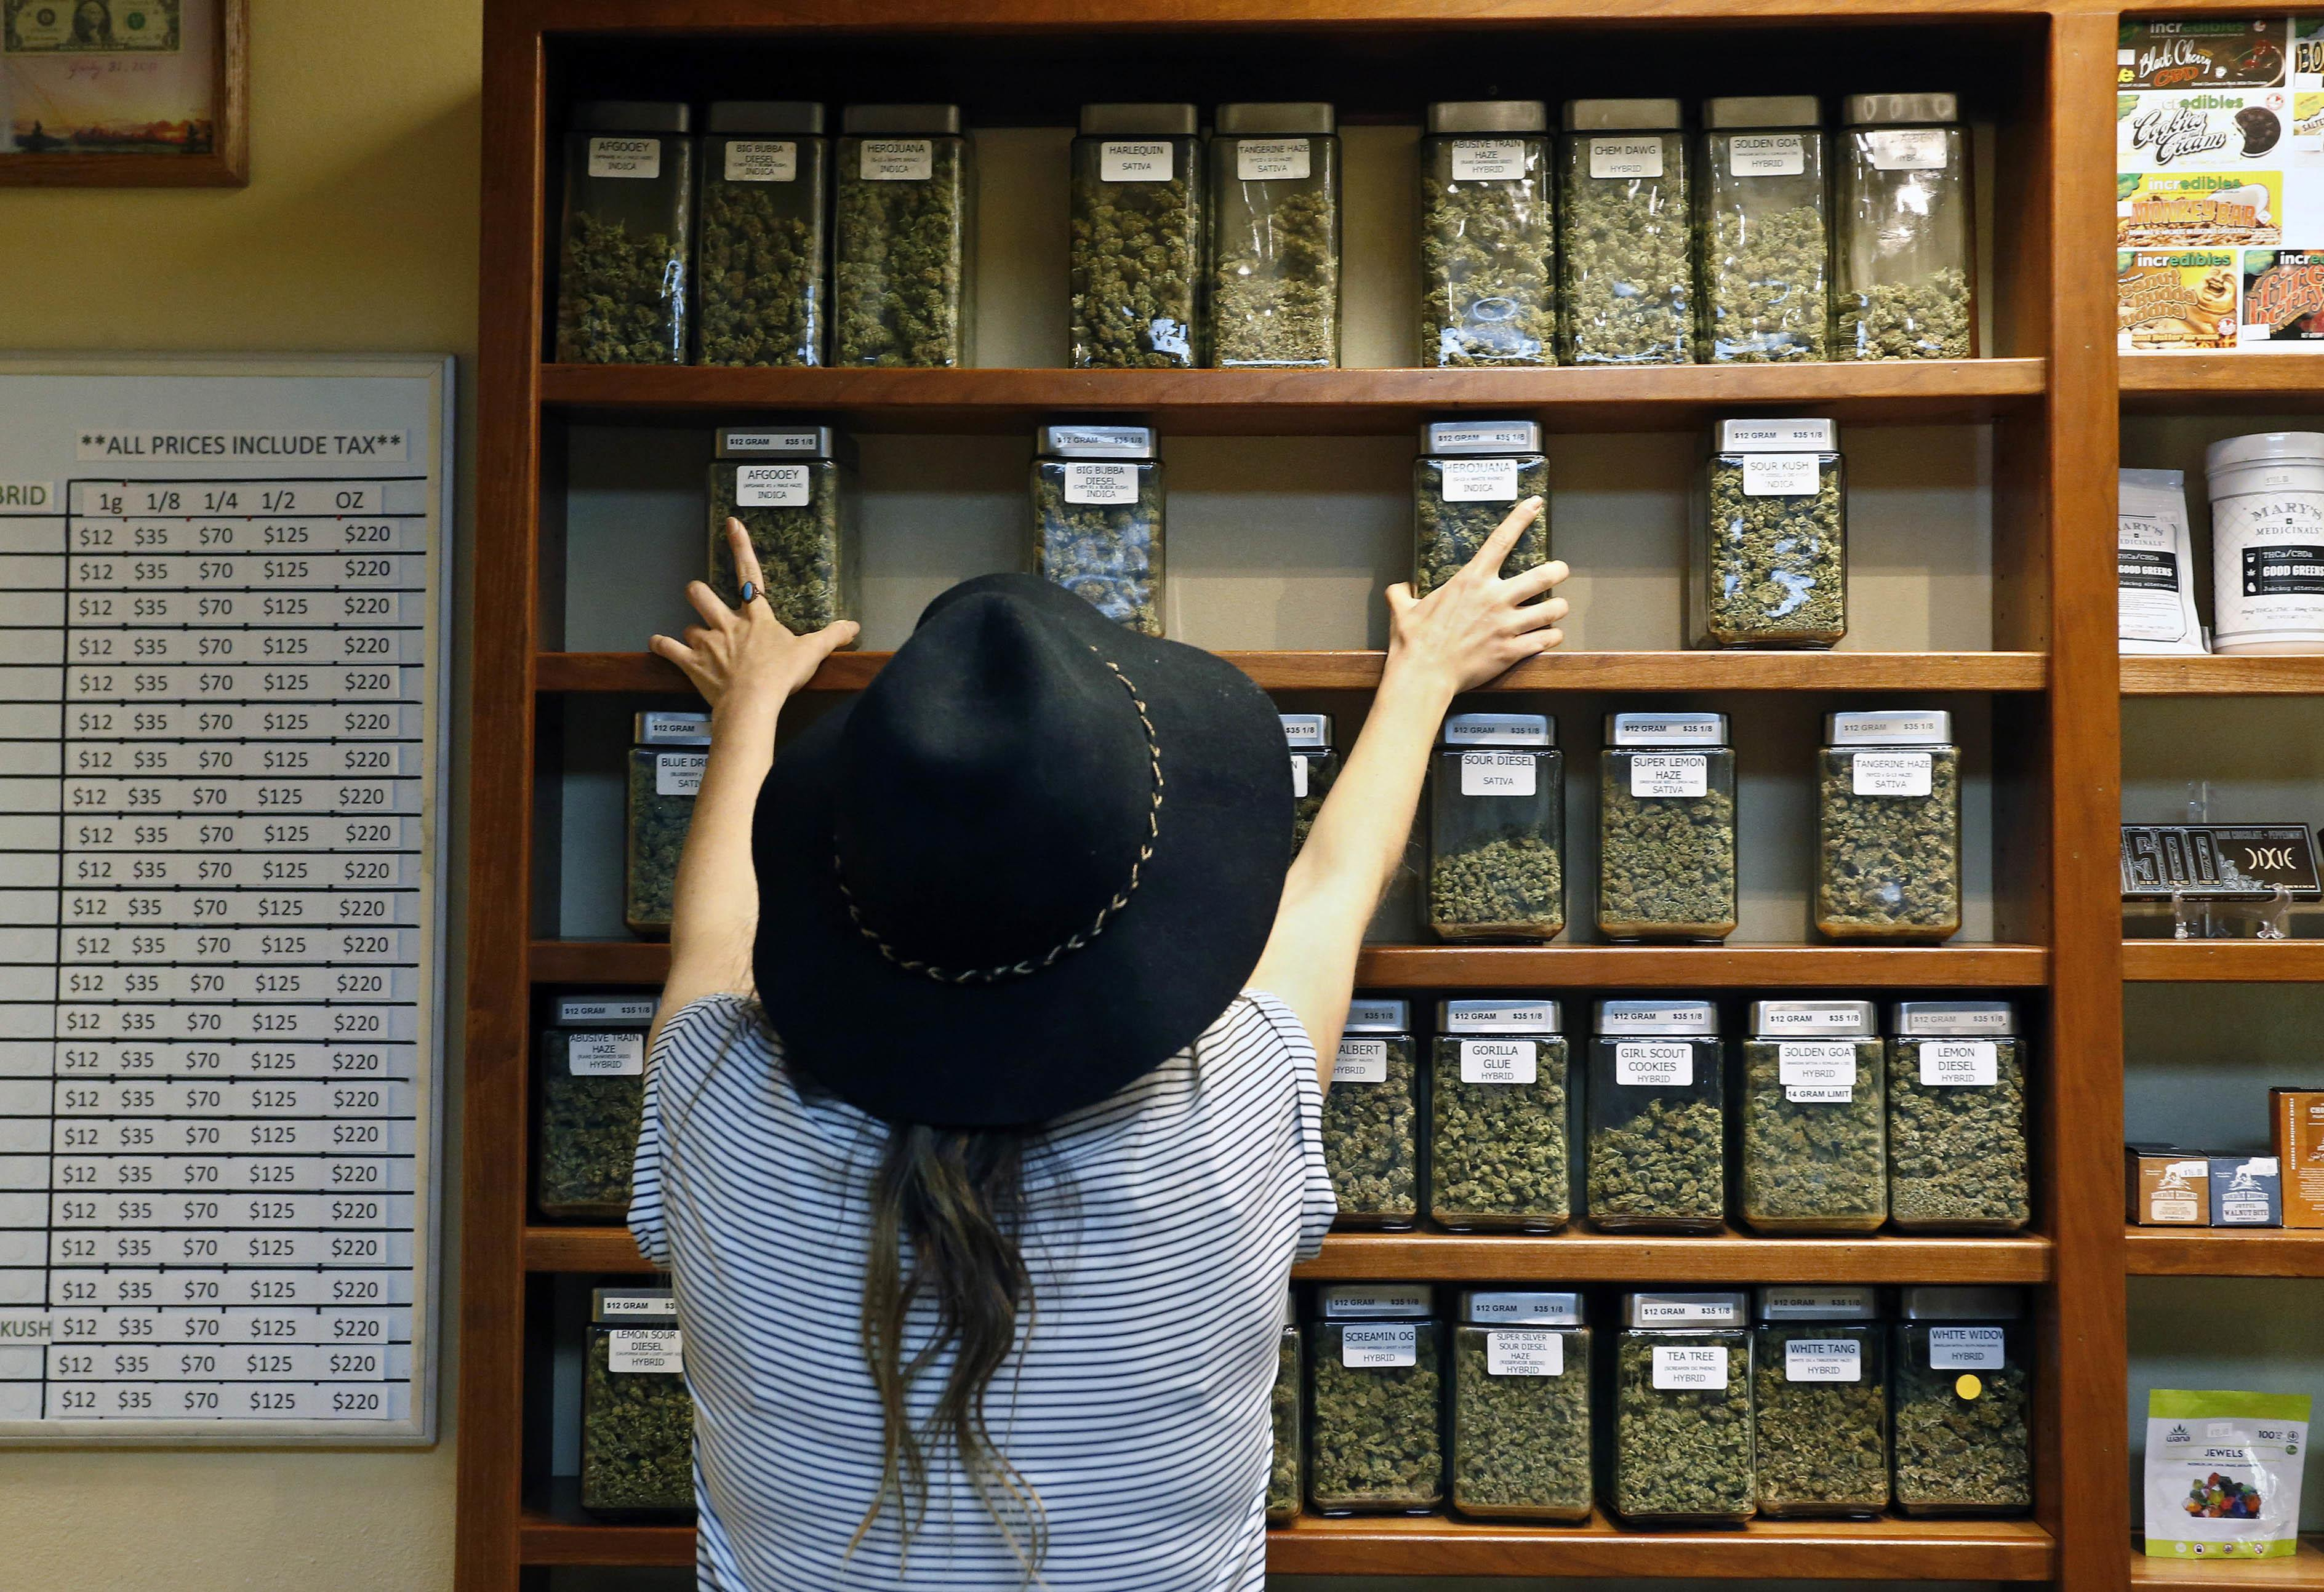 More U.S. adults use marijuana